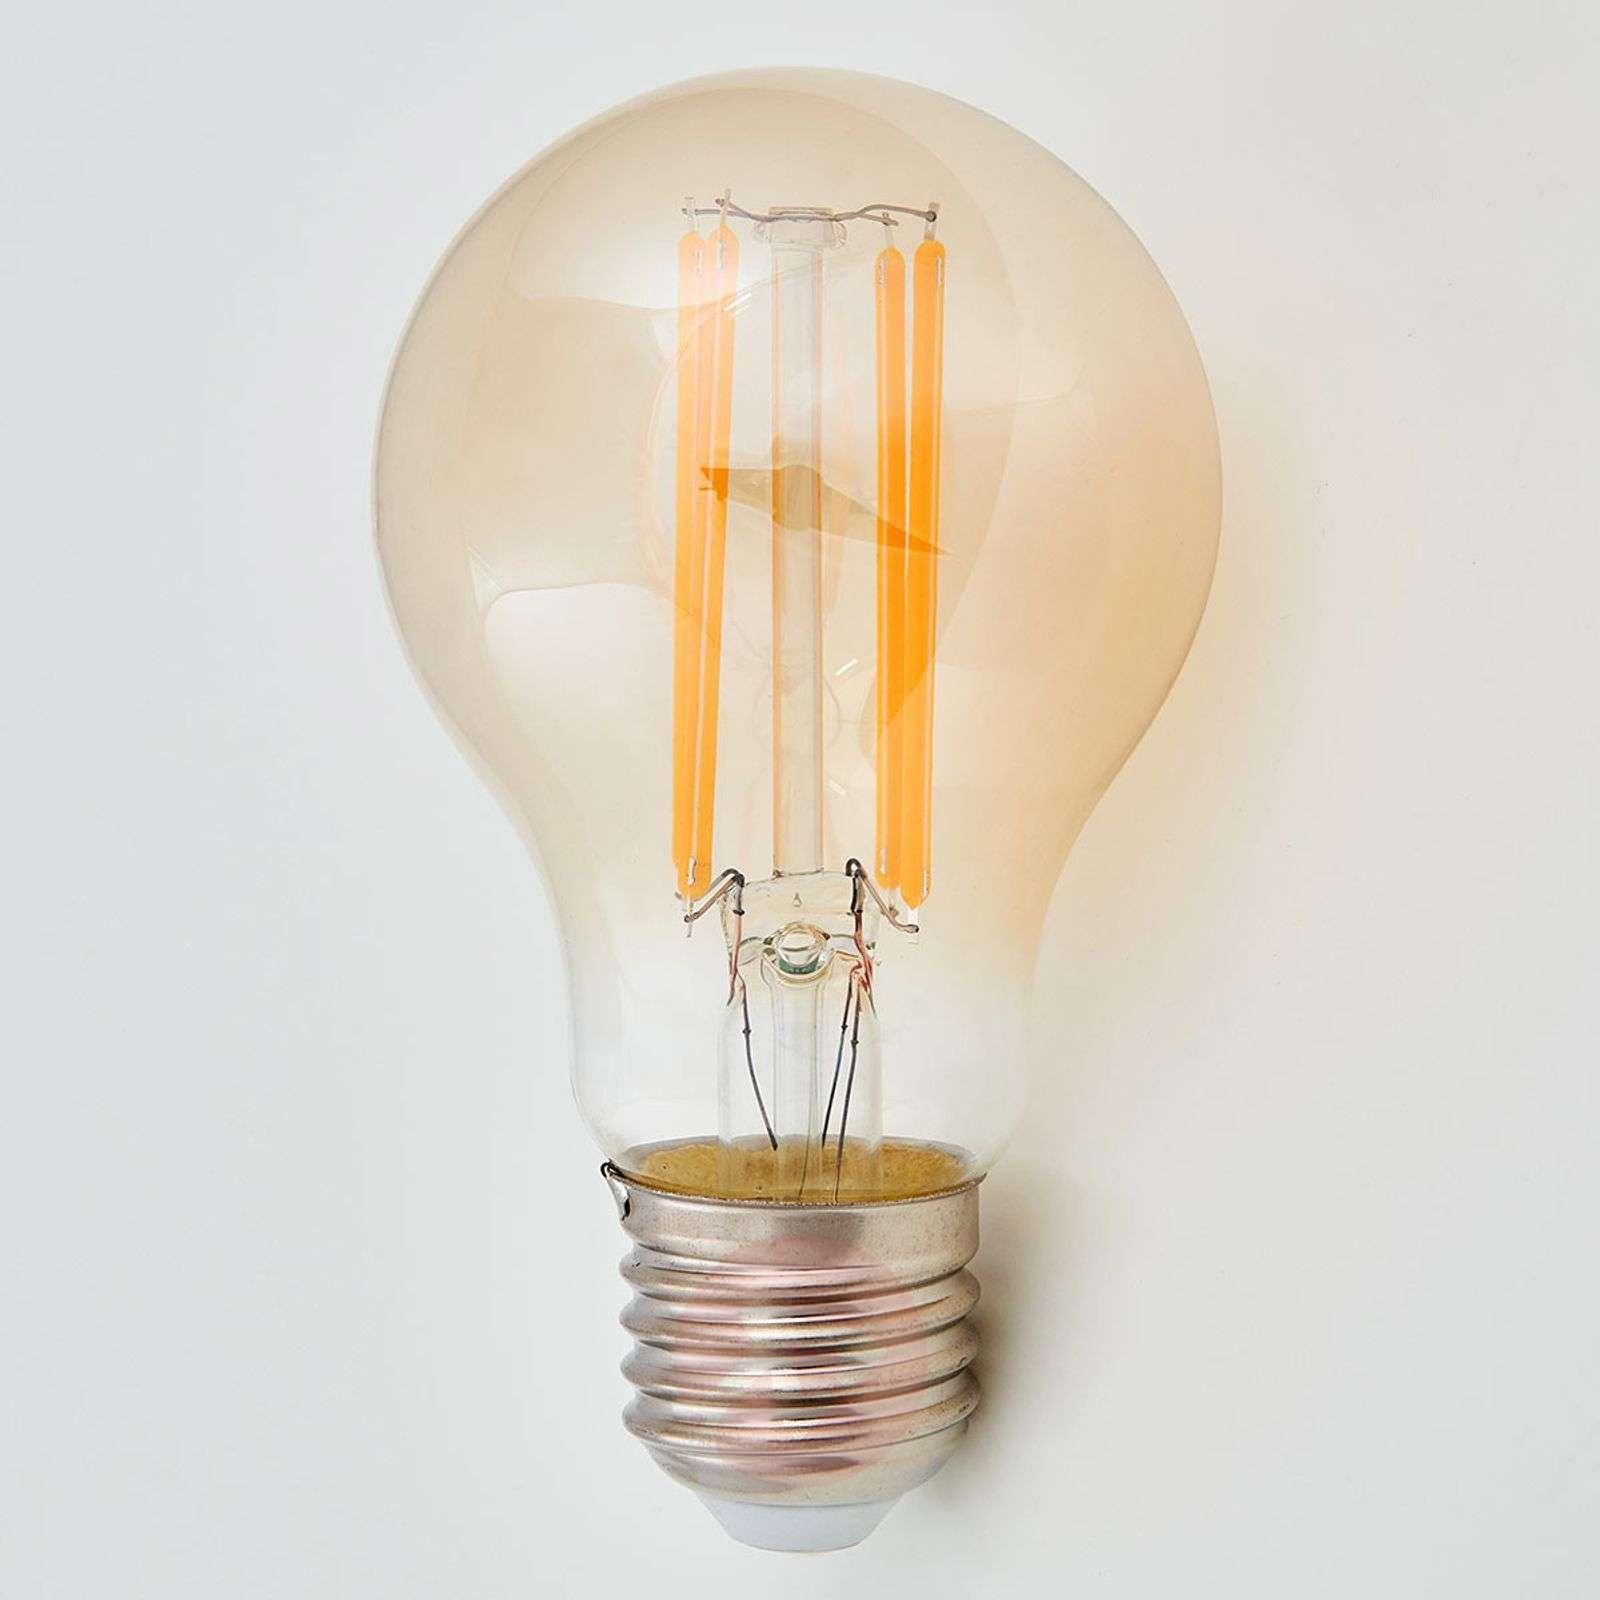 E27-LED-filamenttilamppu 6 W 500 lm ambra 2200 K-9993041-01